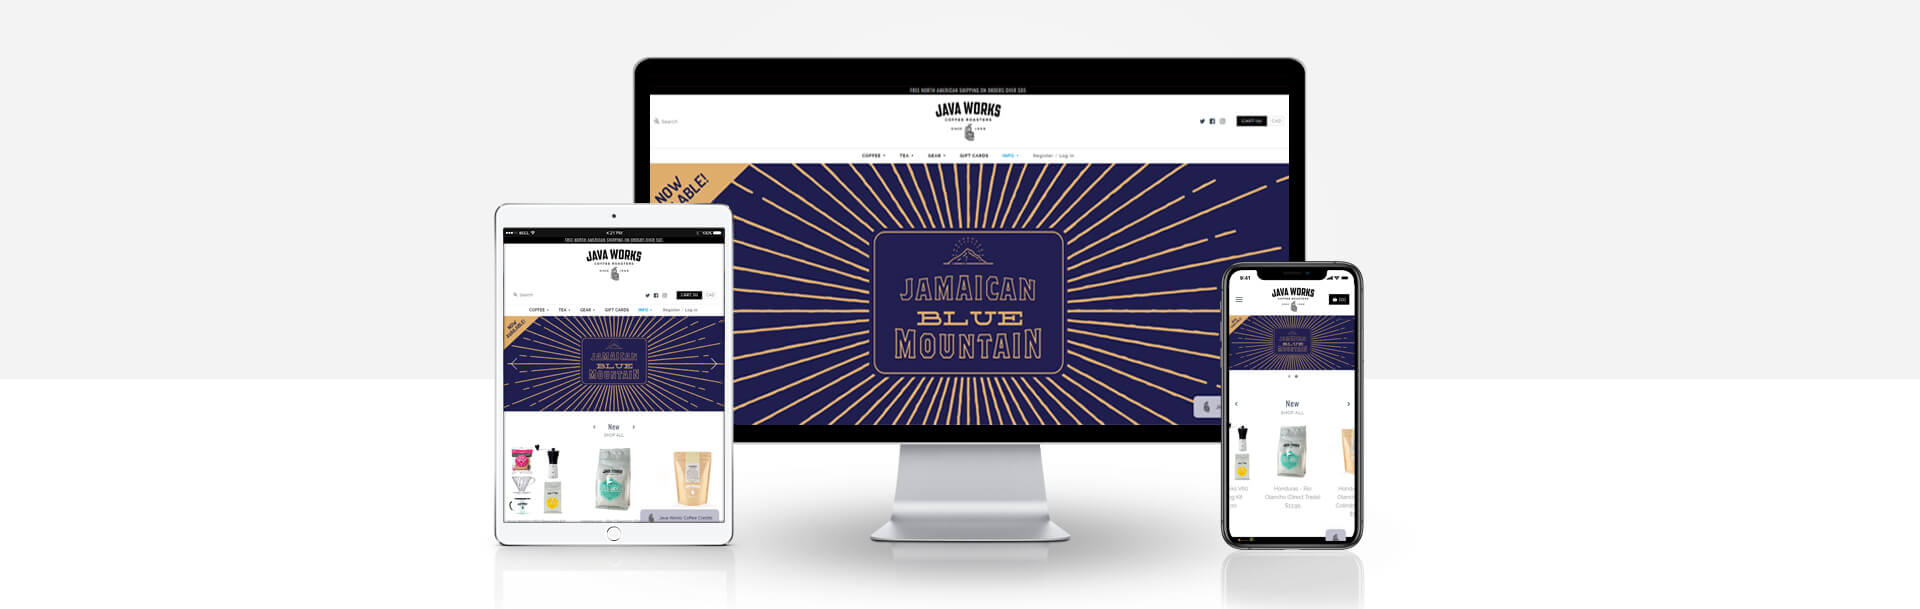 Magento coffee store website